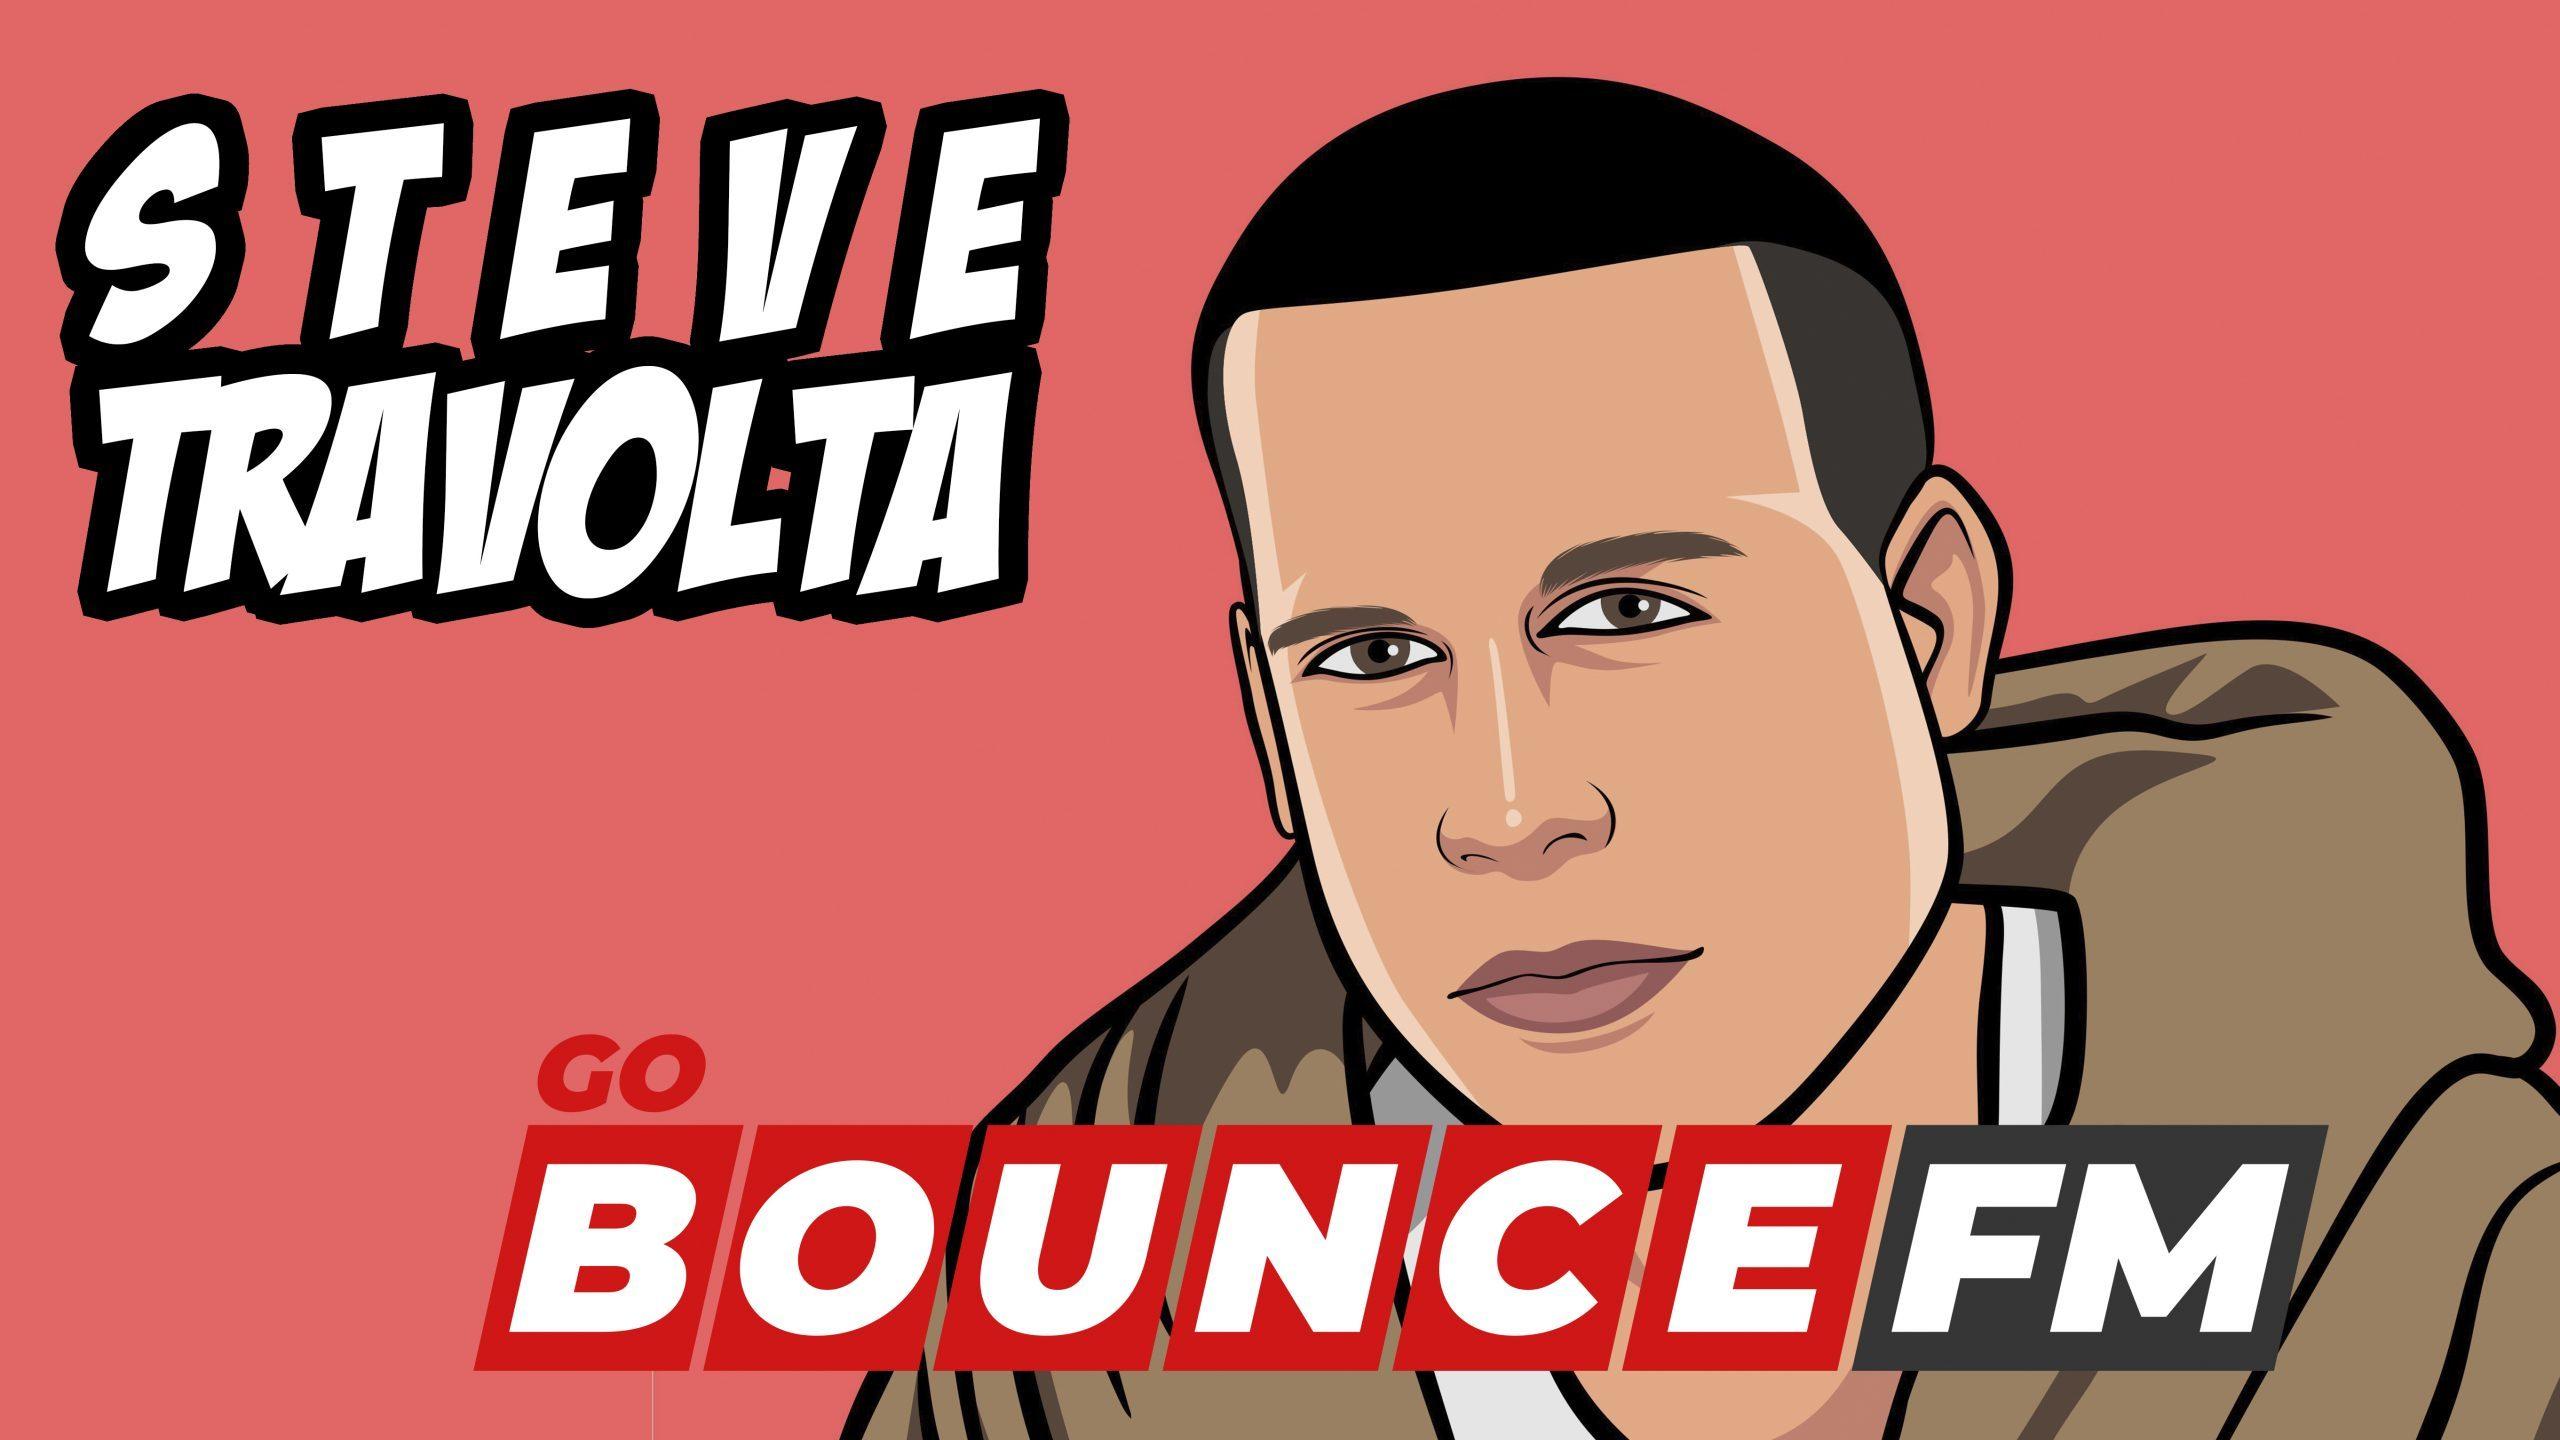 Episode 3 - The Steve Travolta Interview